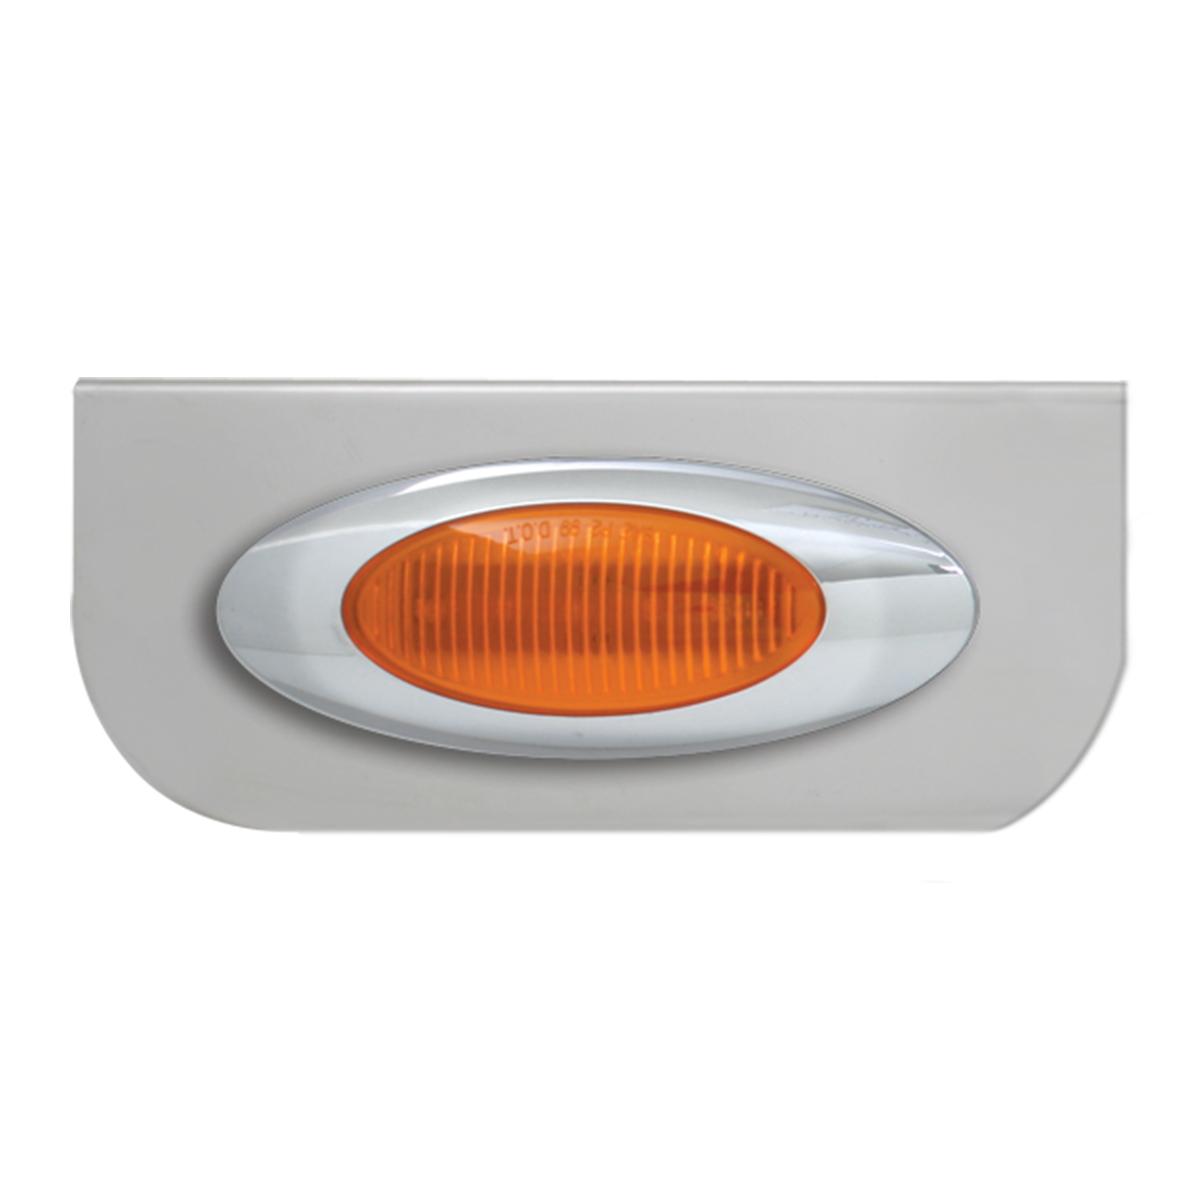 "#89020 Single Stainless Steel ""L"" Shape Light Bracket with Plug-In Y2K Incandescent Light"